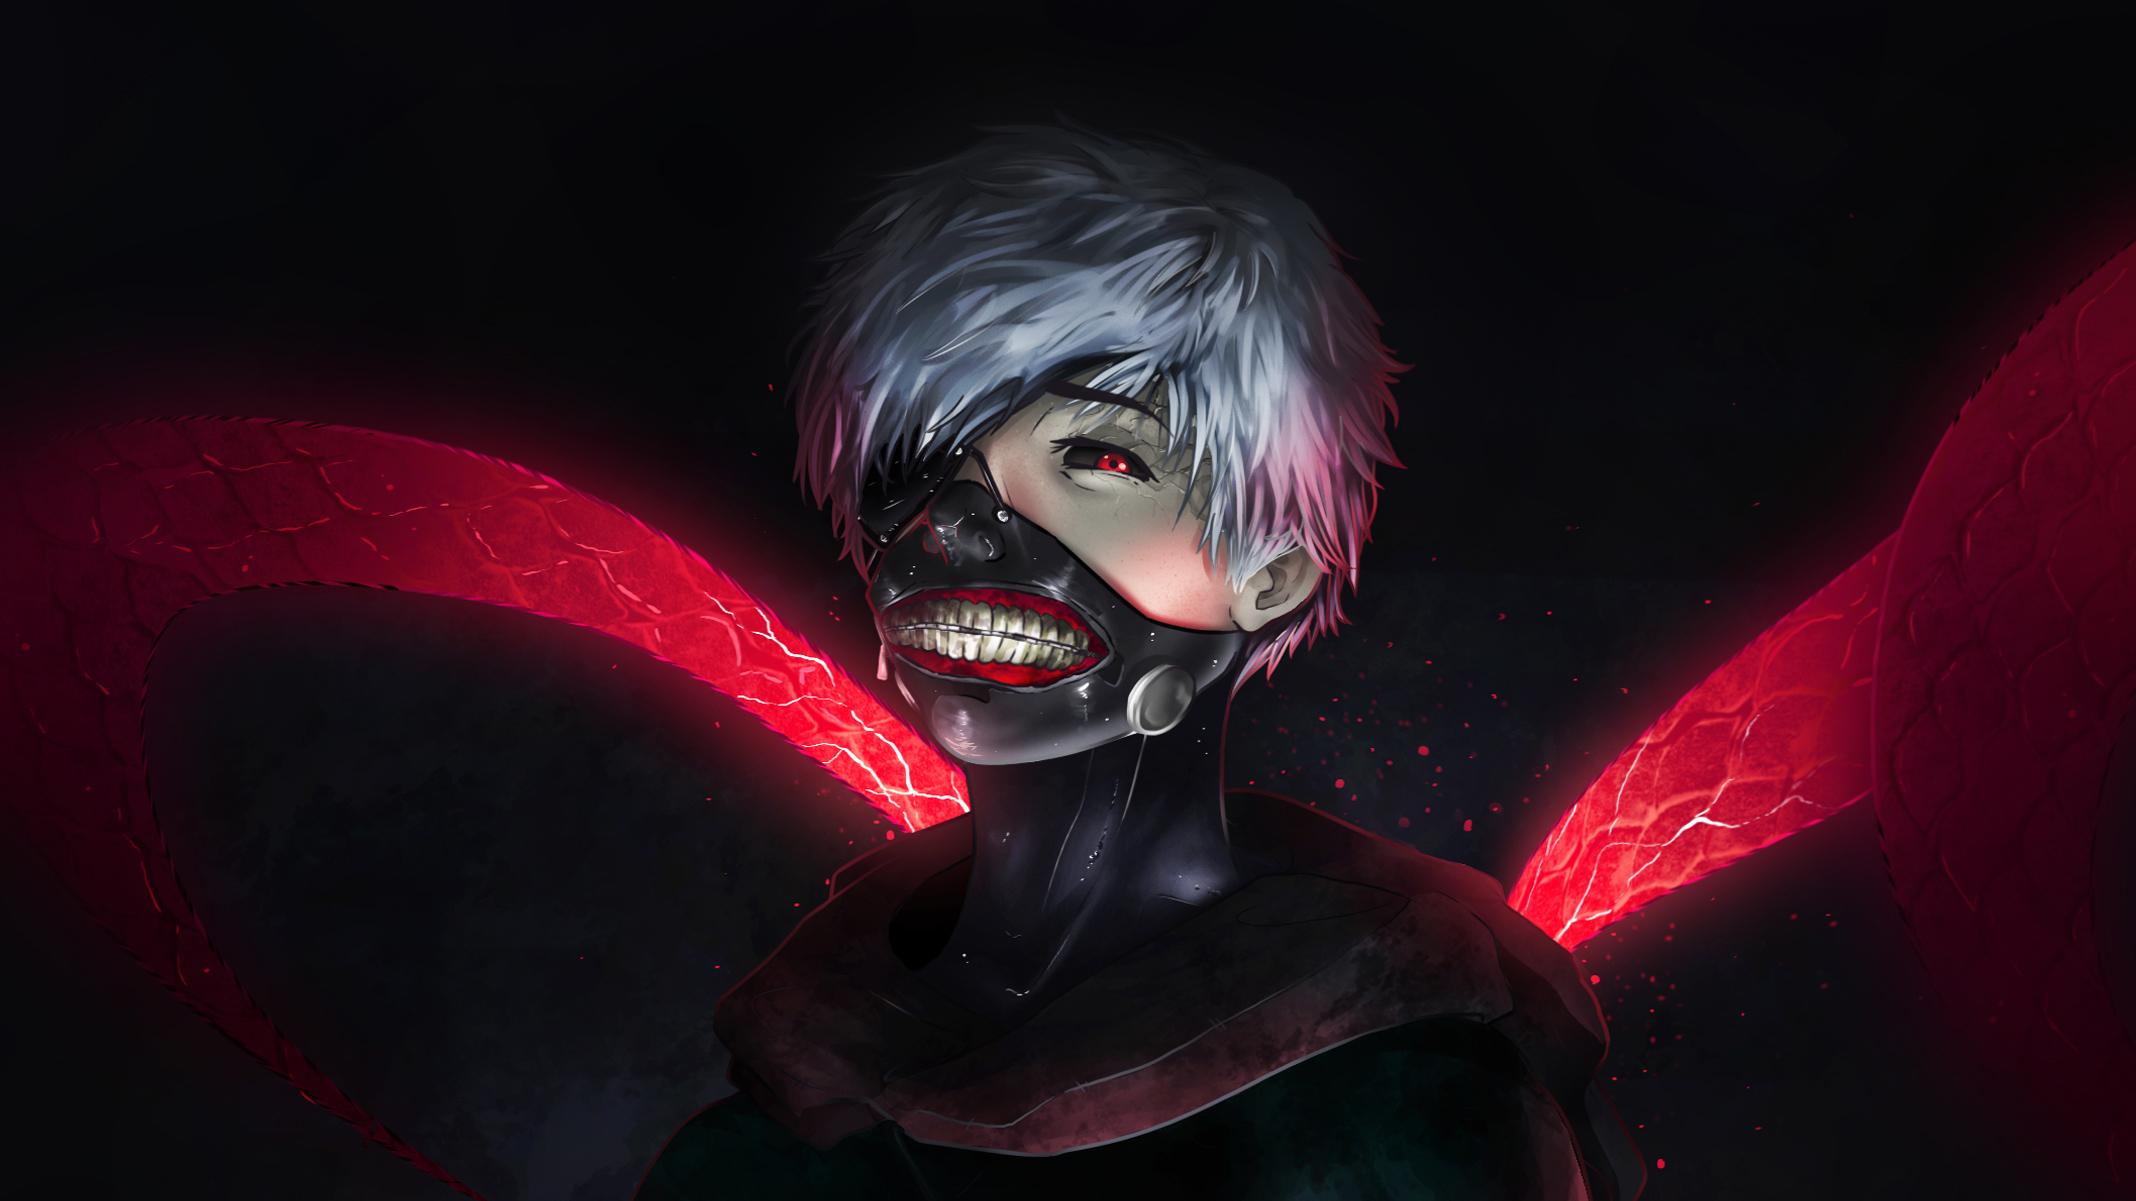 Ken Kaneki Tokyo Ghoul Wallpaper Hd 2253343 Hd Wallpaper Backgrounds Download